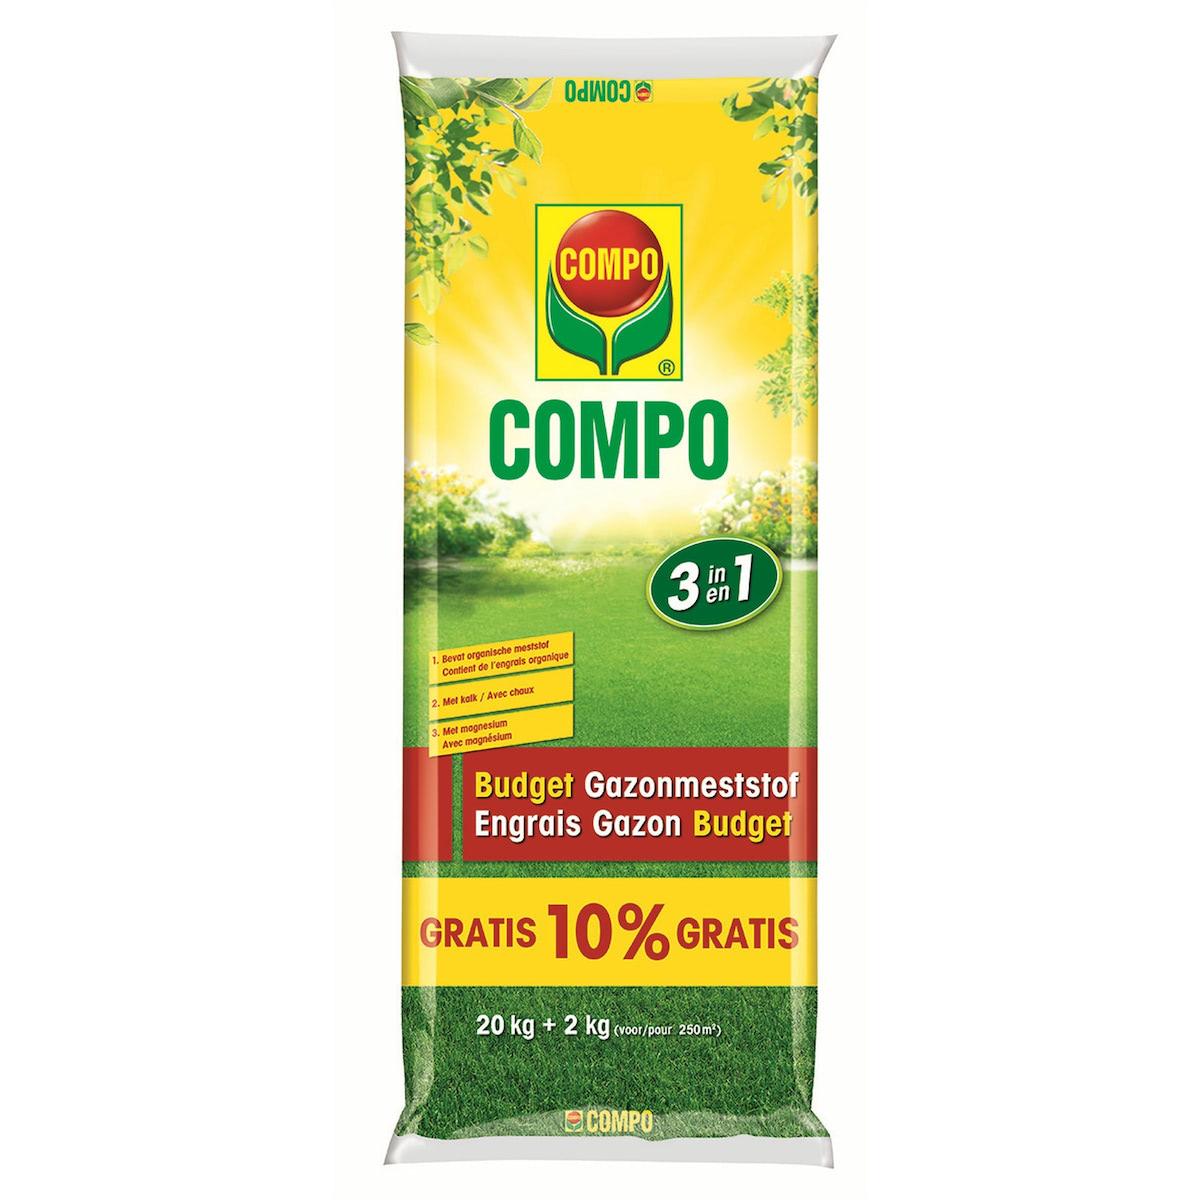 Compo Budget Gazonmeststof 3 in 1 20 + 10% gratis